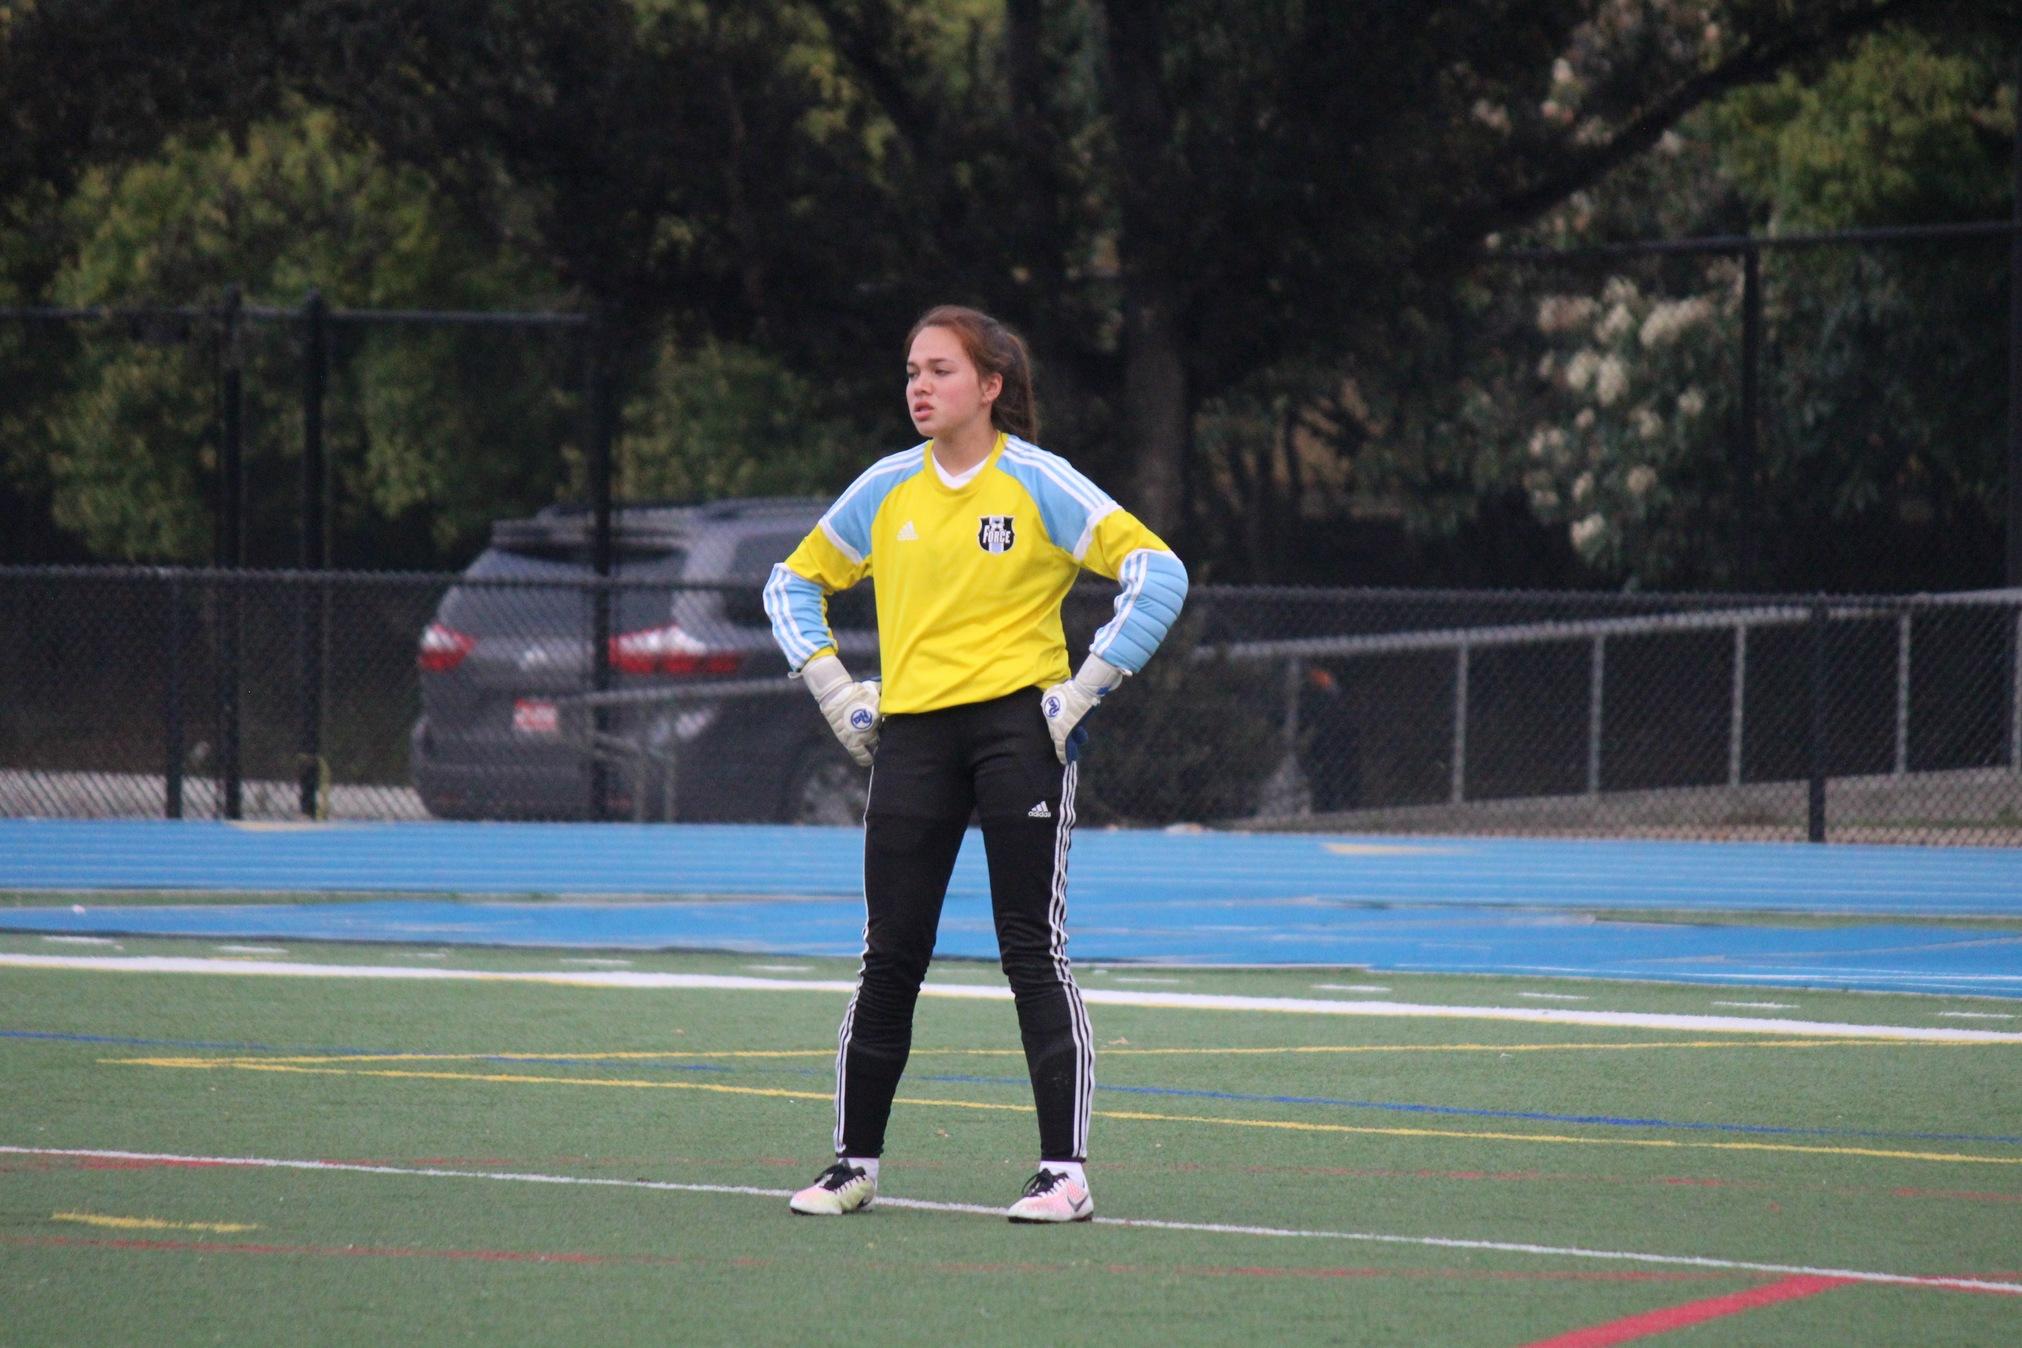 Freshman+Sarah+Stulbarg+defends+the+goal+throughout+the+season.+